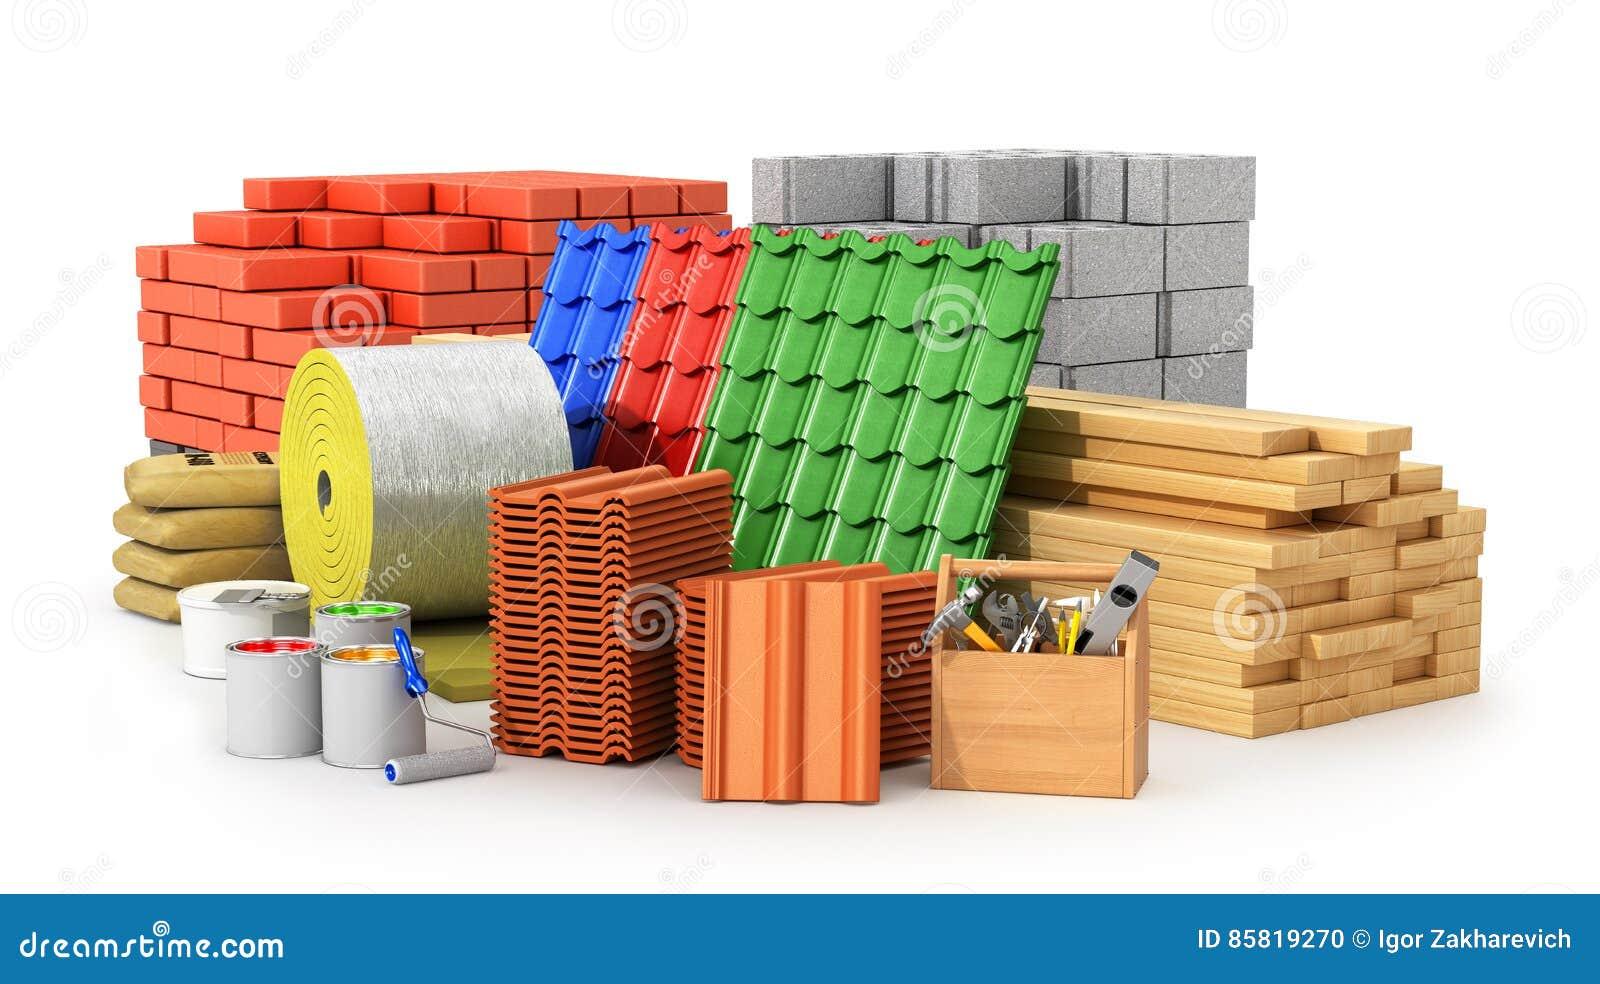 Materials cartoons illustrations vector stock images for Materiali da costruzione economici